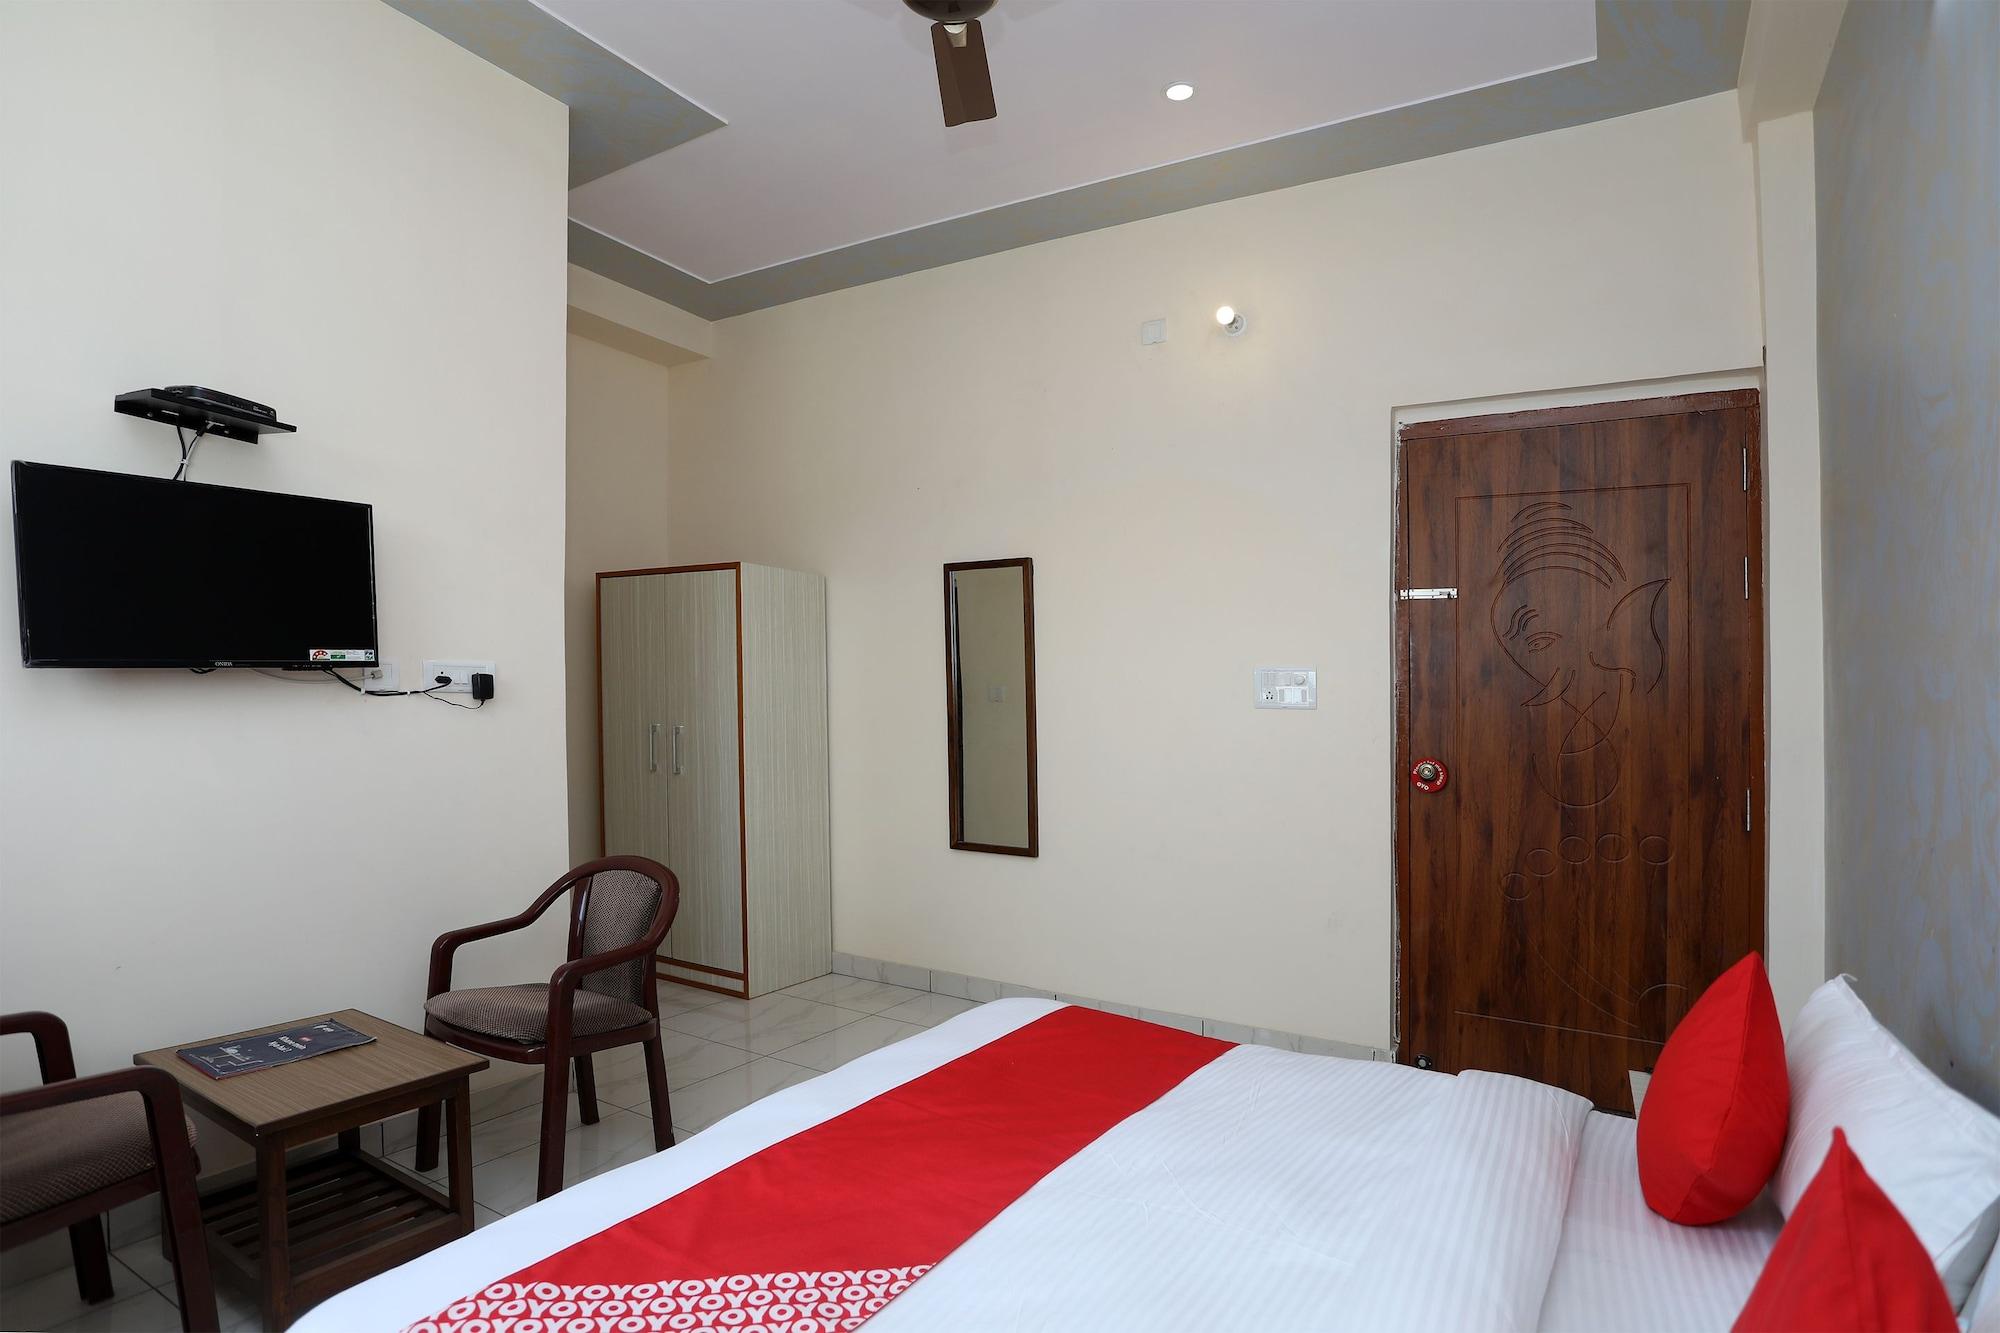 OYO 17291 Shree Ram Palace, Rewari